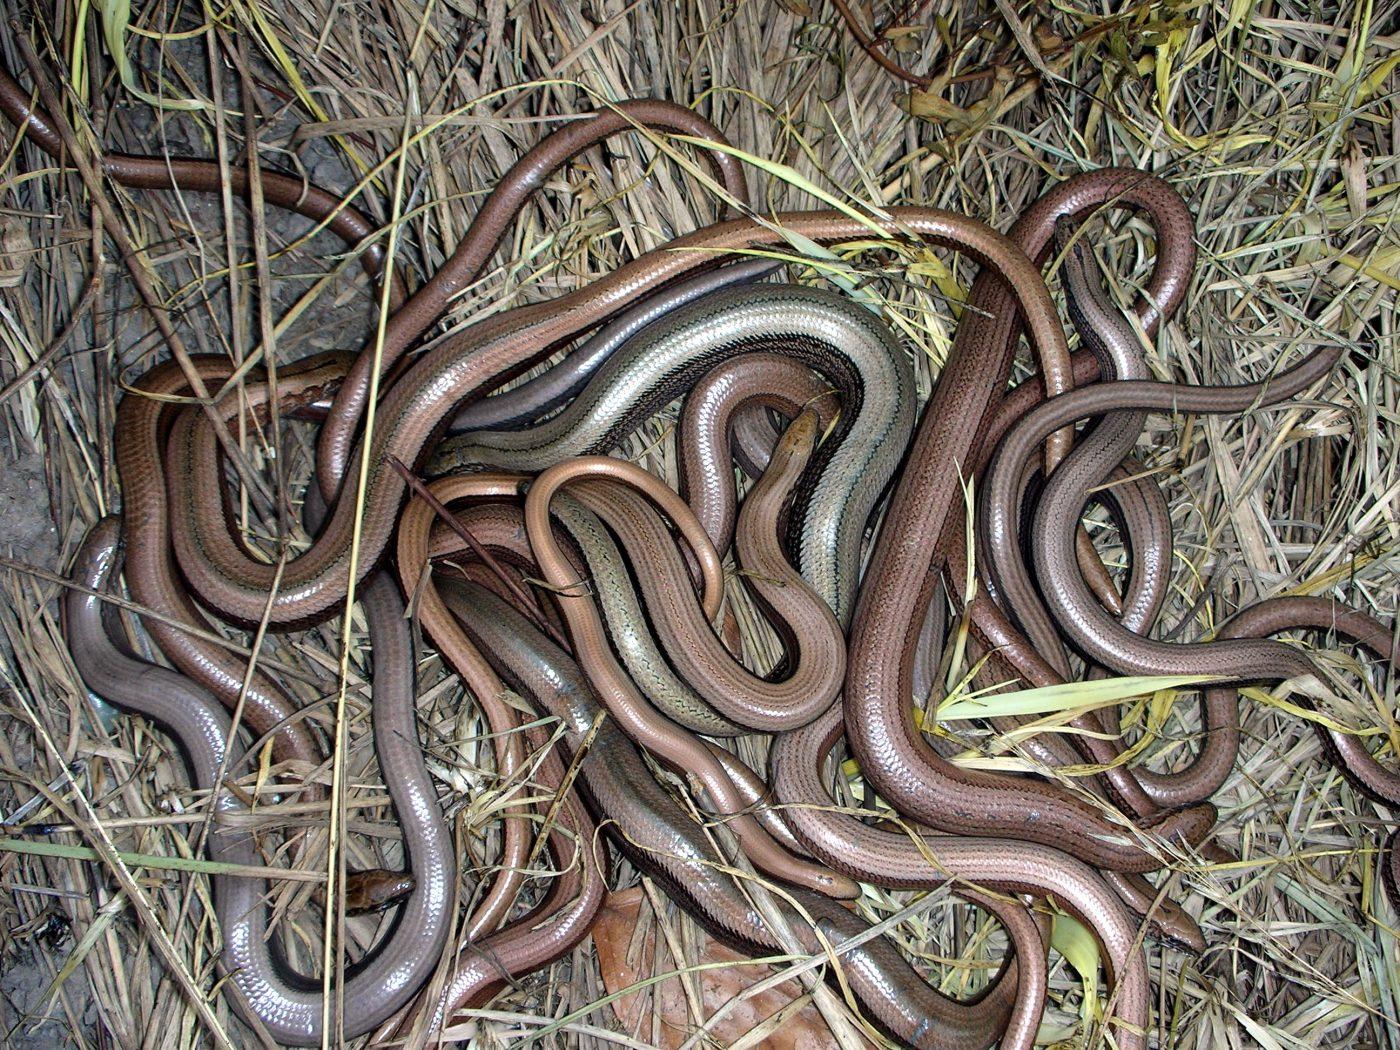 Slow Worm Krag